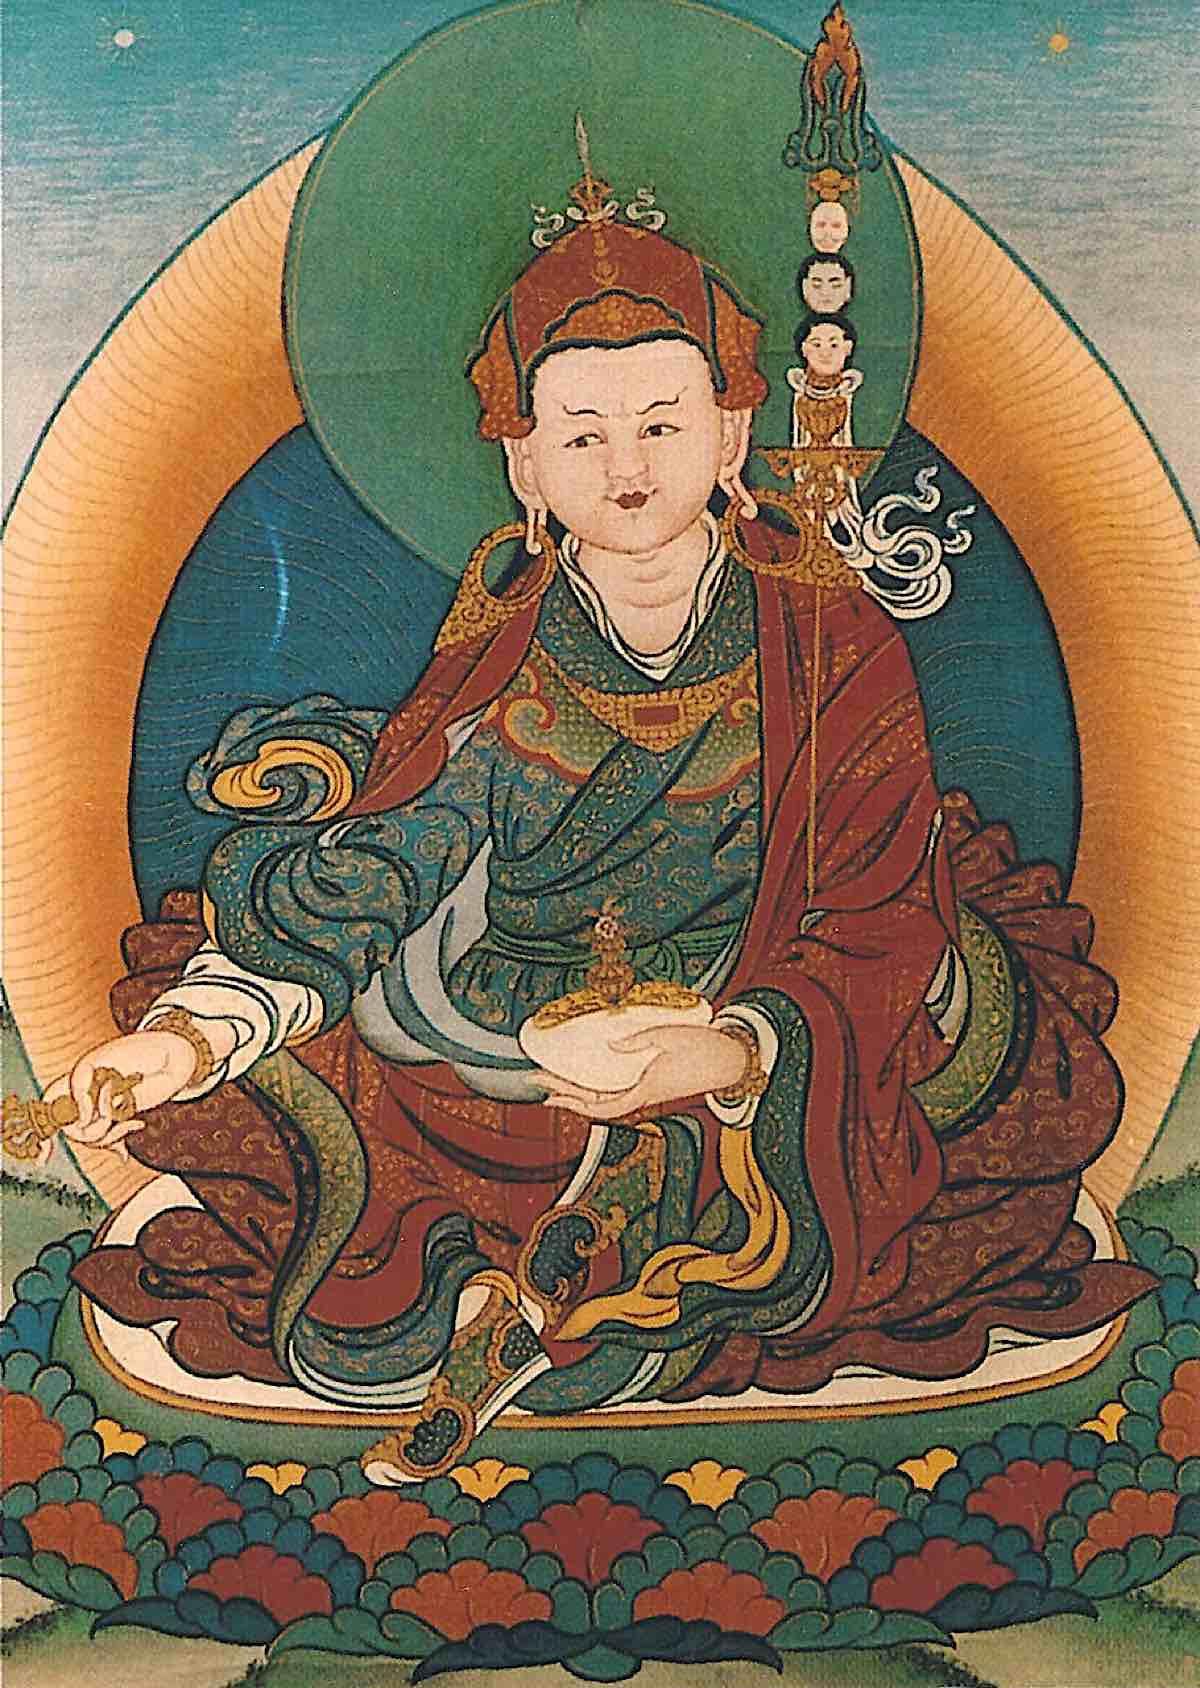 Buddha Weekly Guru RInpoche beautiful image Buddhism